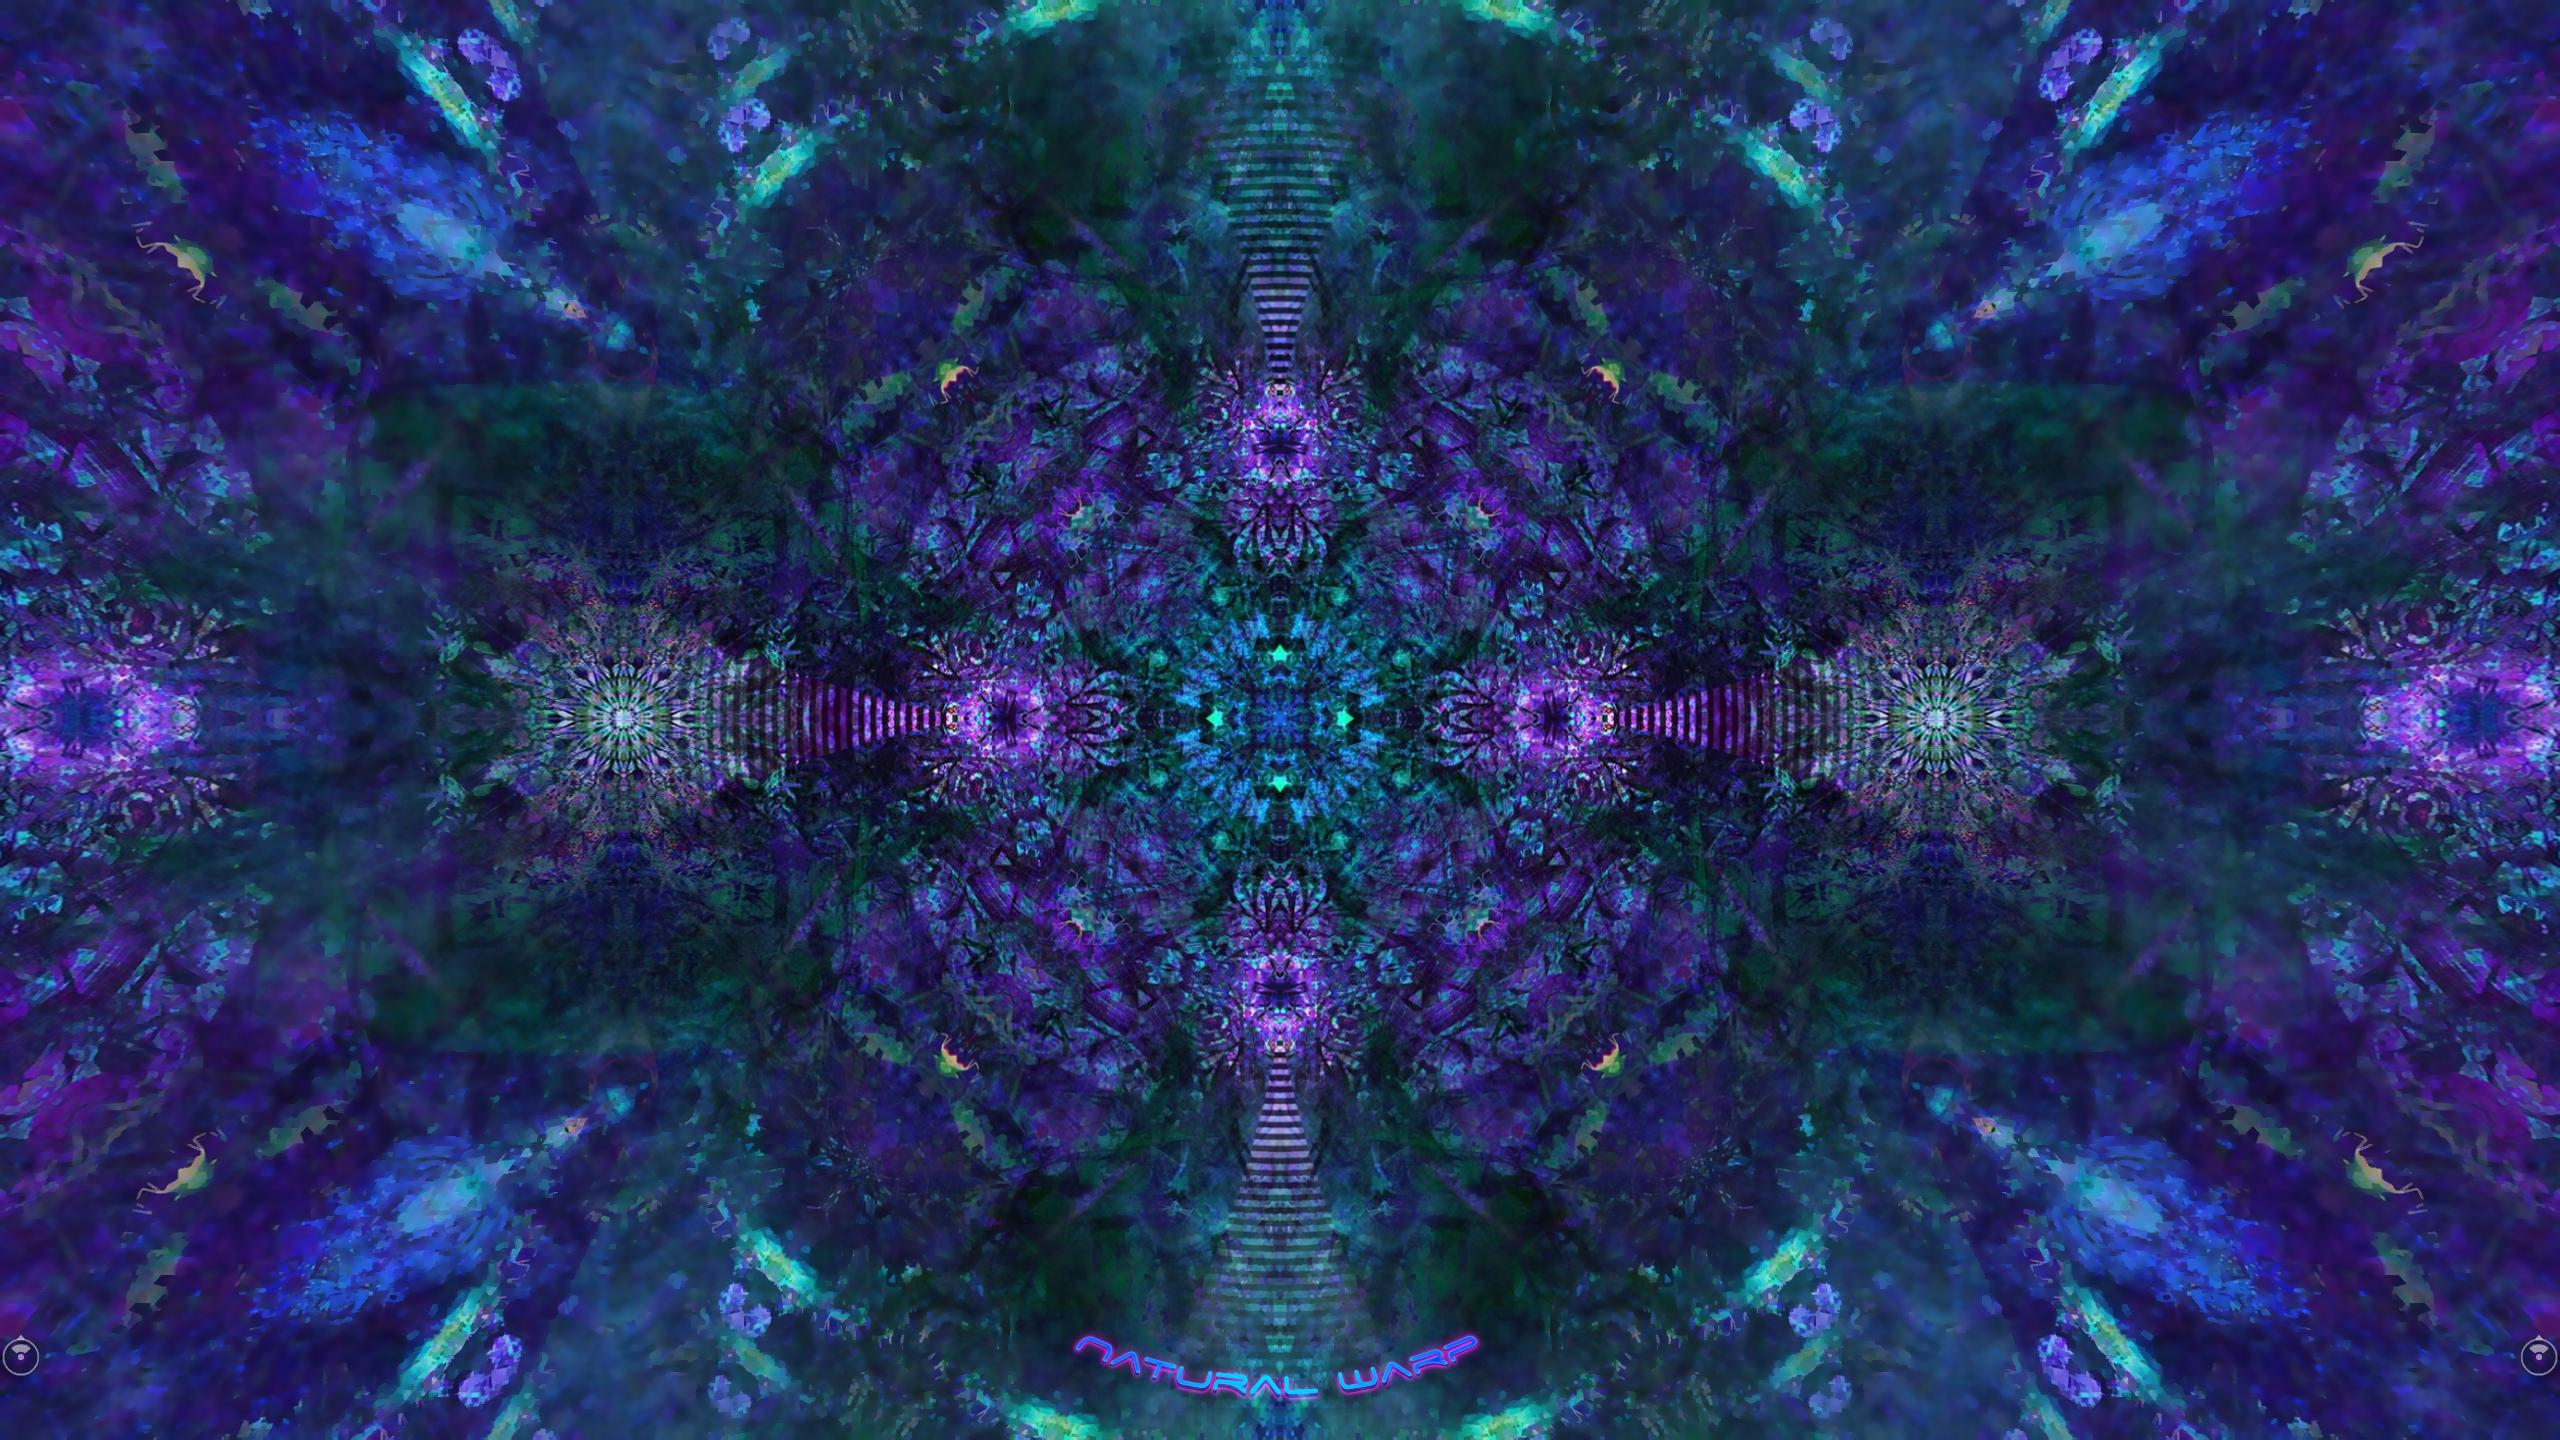 Defying the Void   The Eternal Fractal Dance 2560x1440